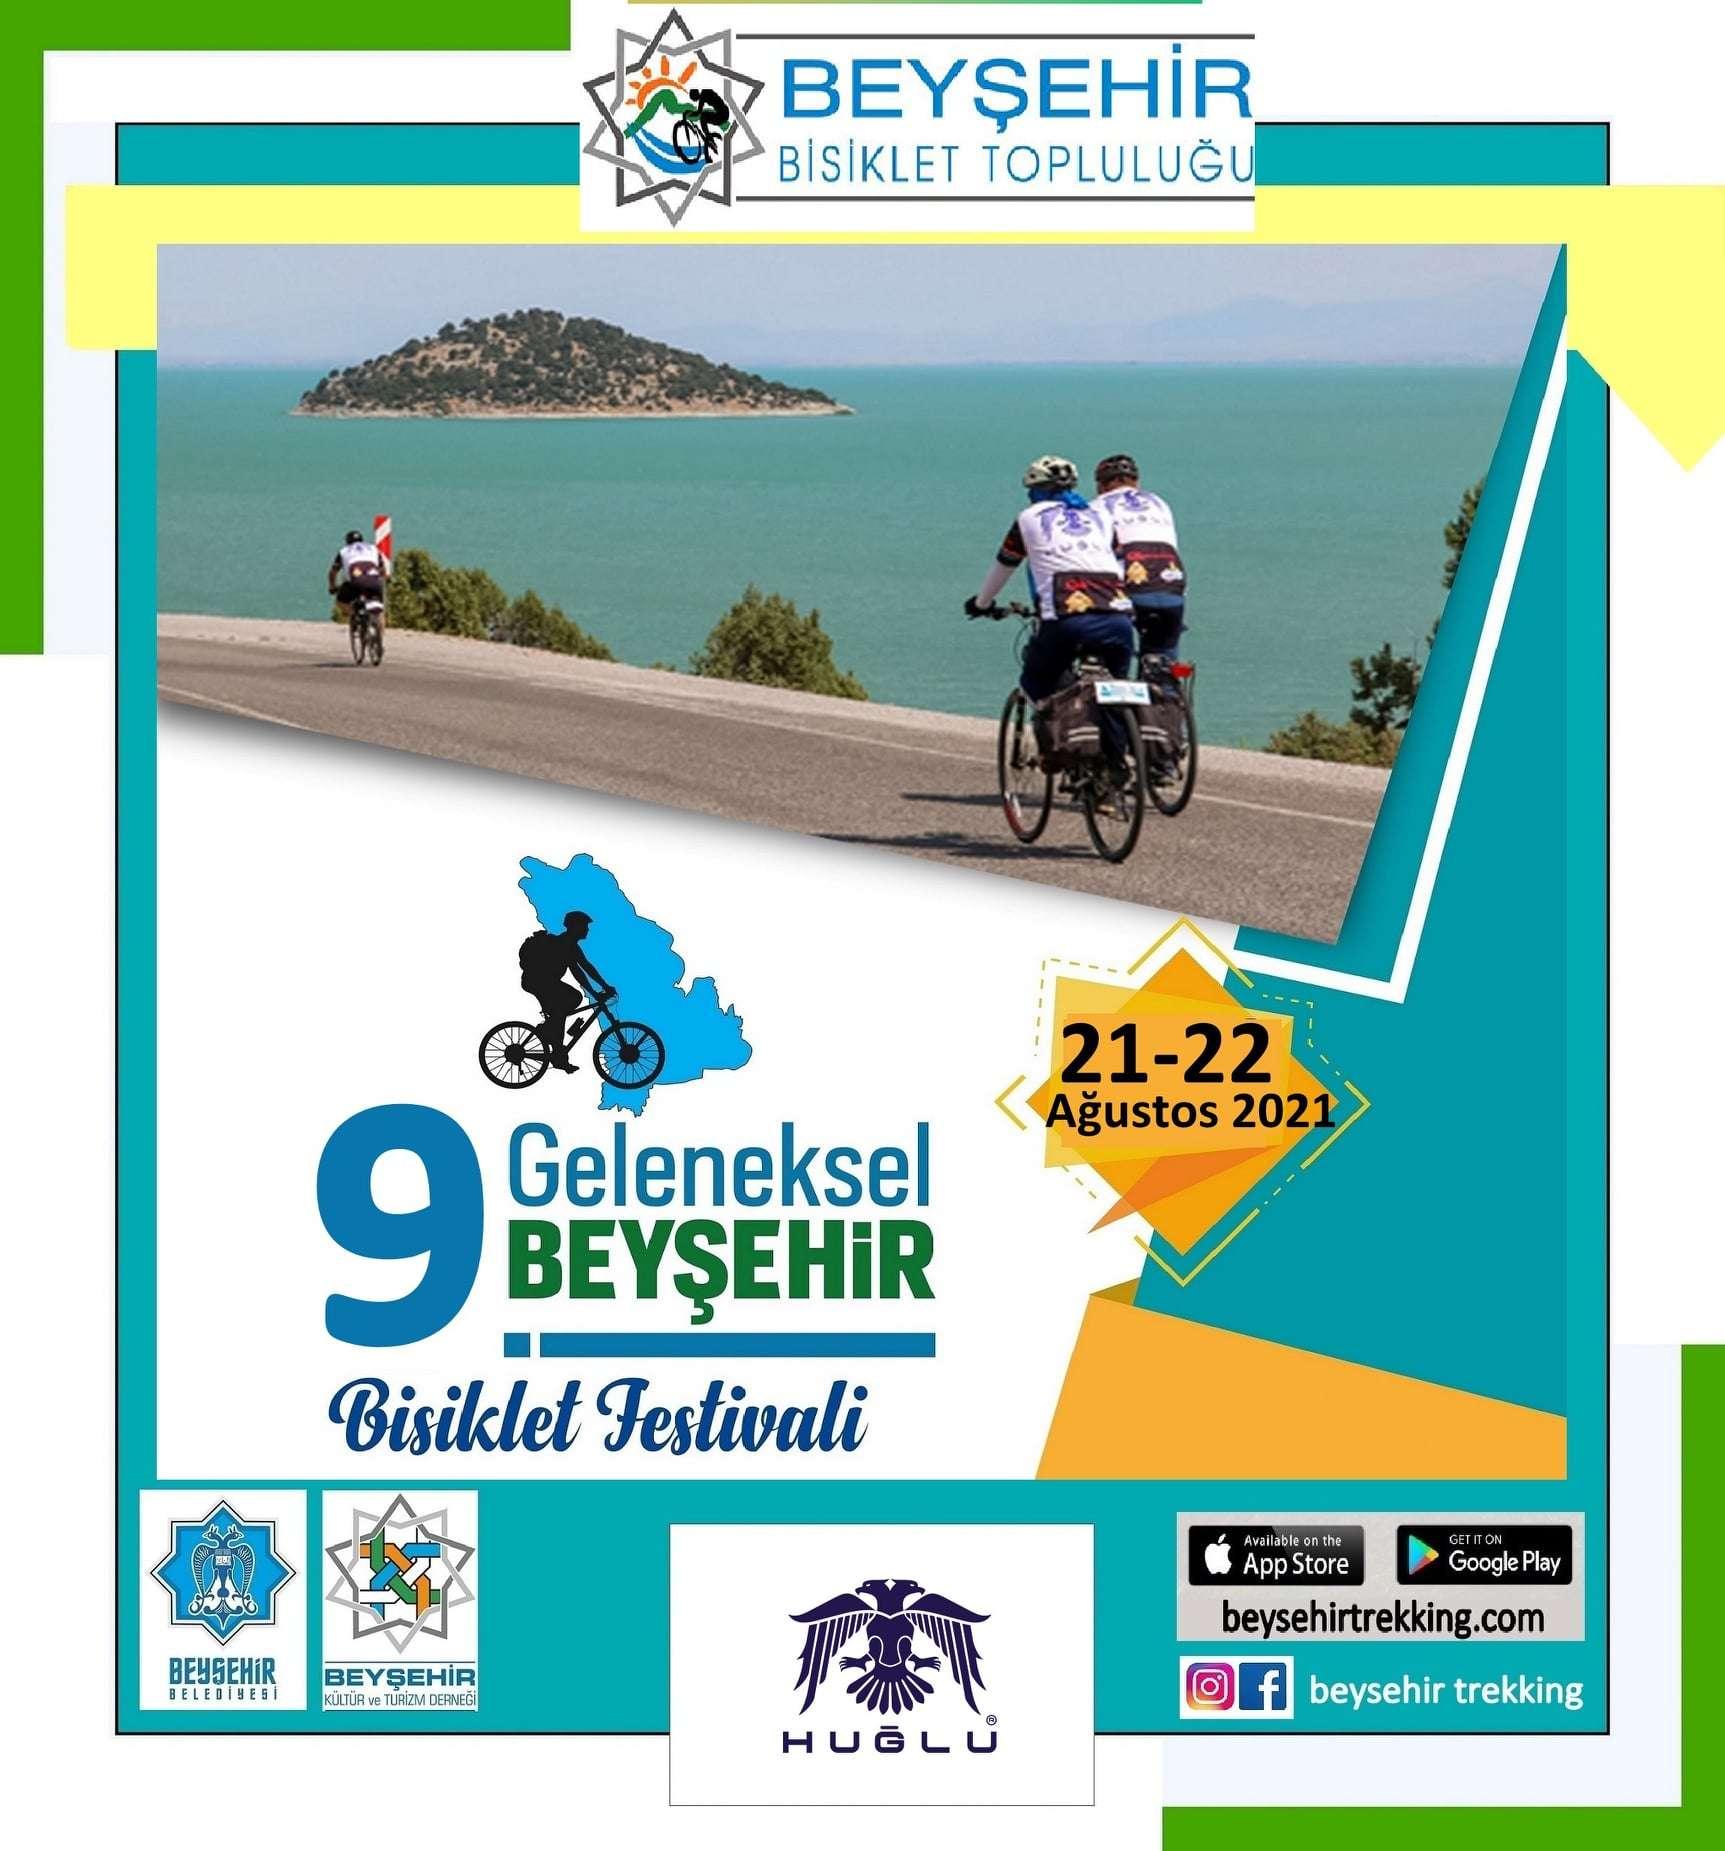 beysehir-bisiklet-festivali-105